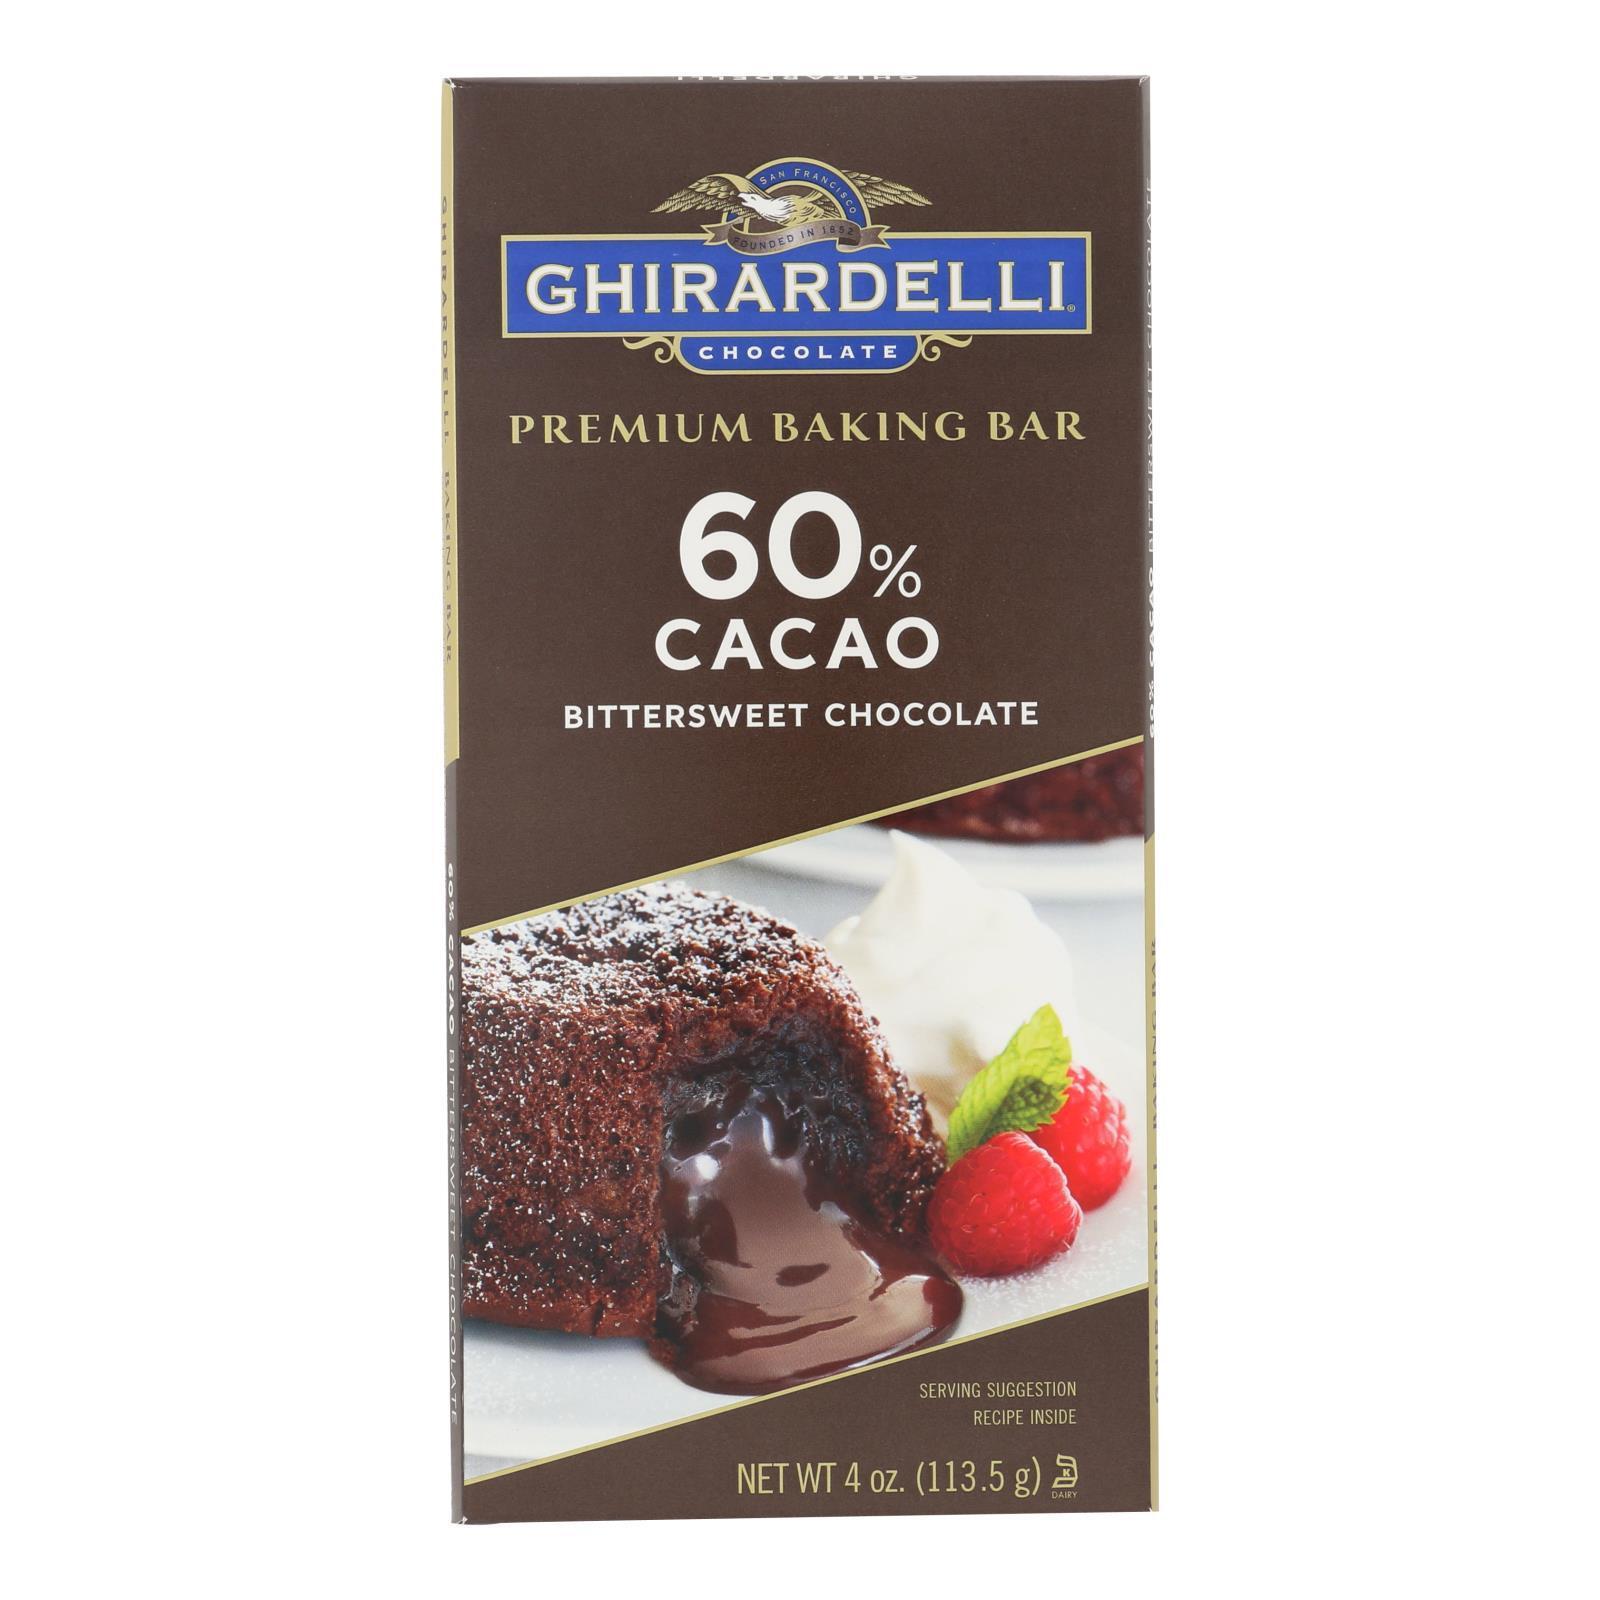 Ghirardelli Premium Baking Bar - 60% Cacao Bittersweet Chocolate - Case of 12 - 4 oz